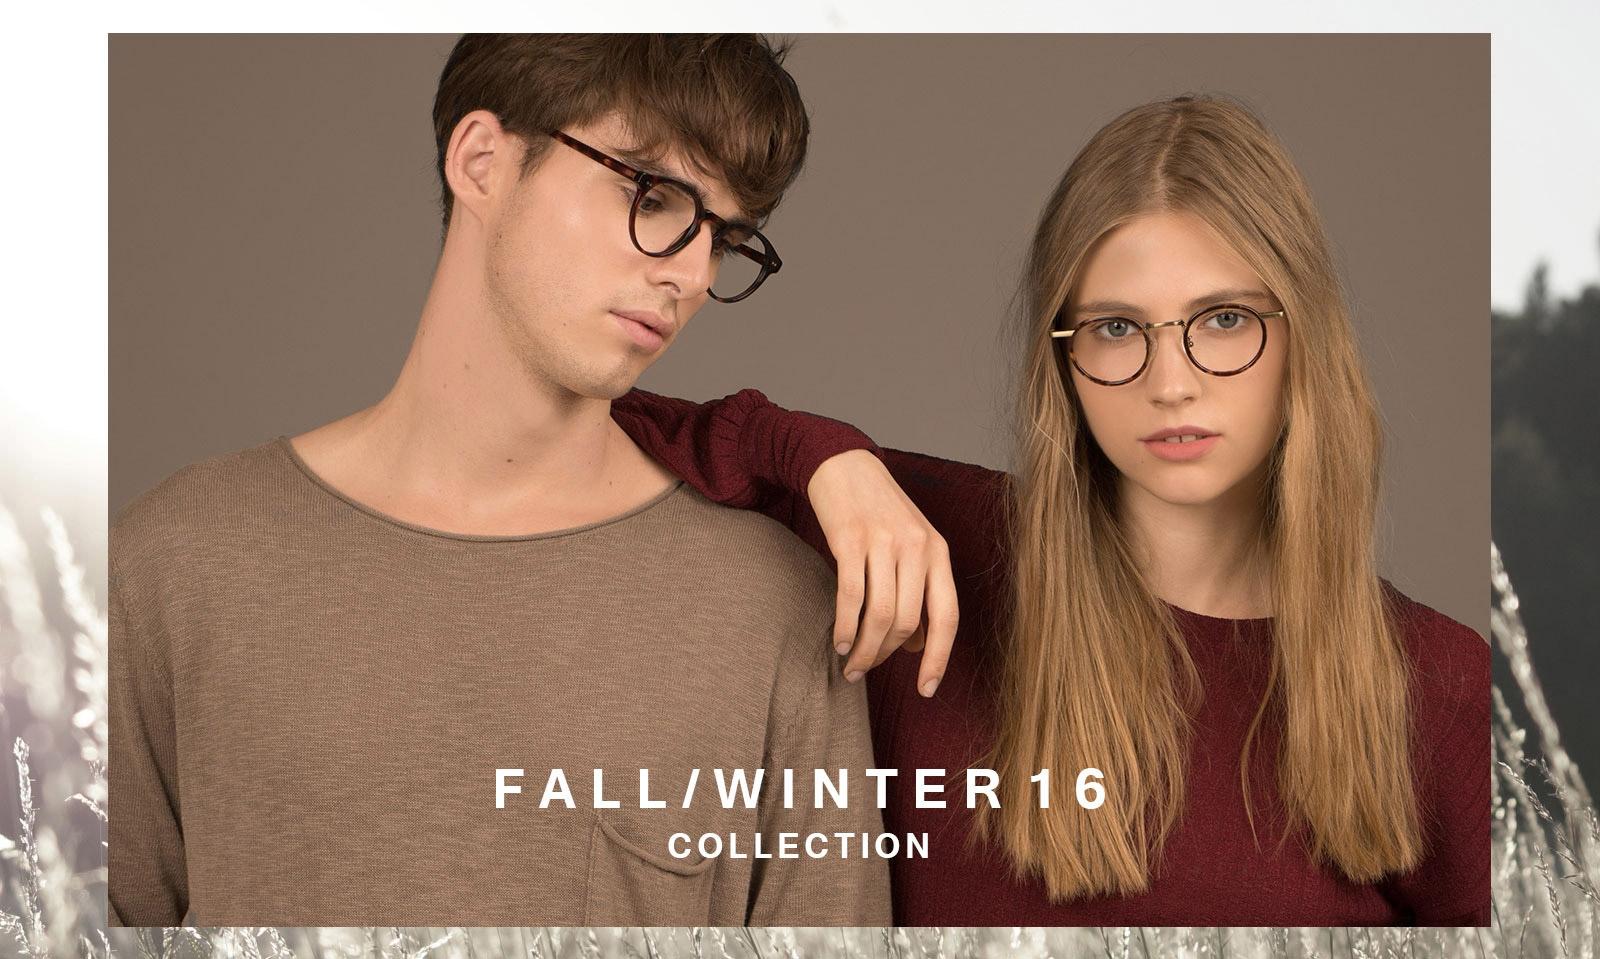 fall/winter 16